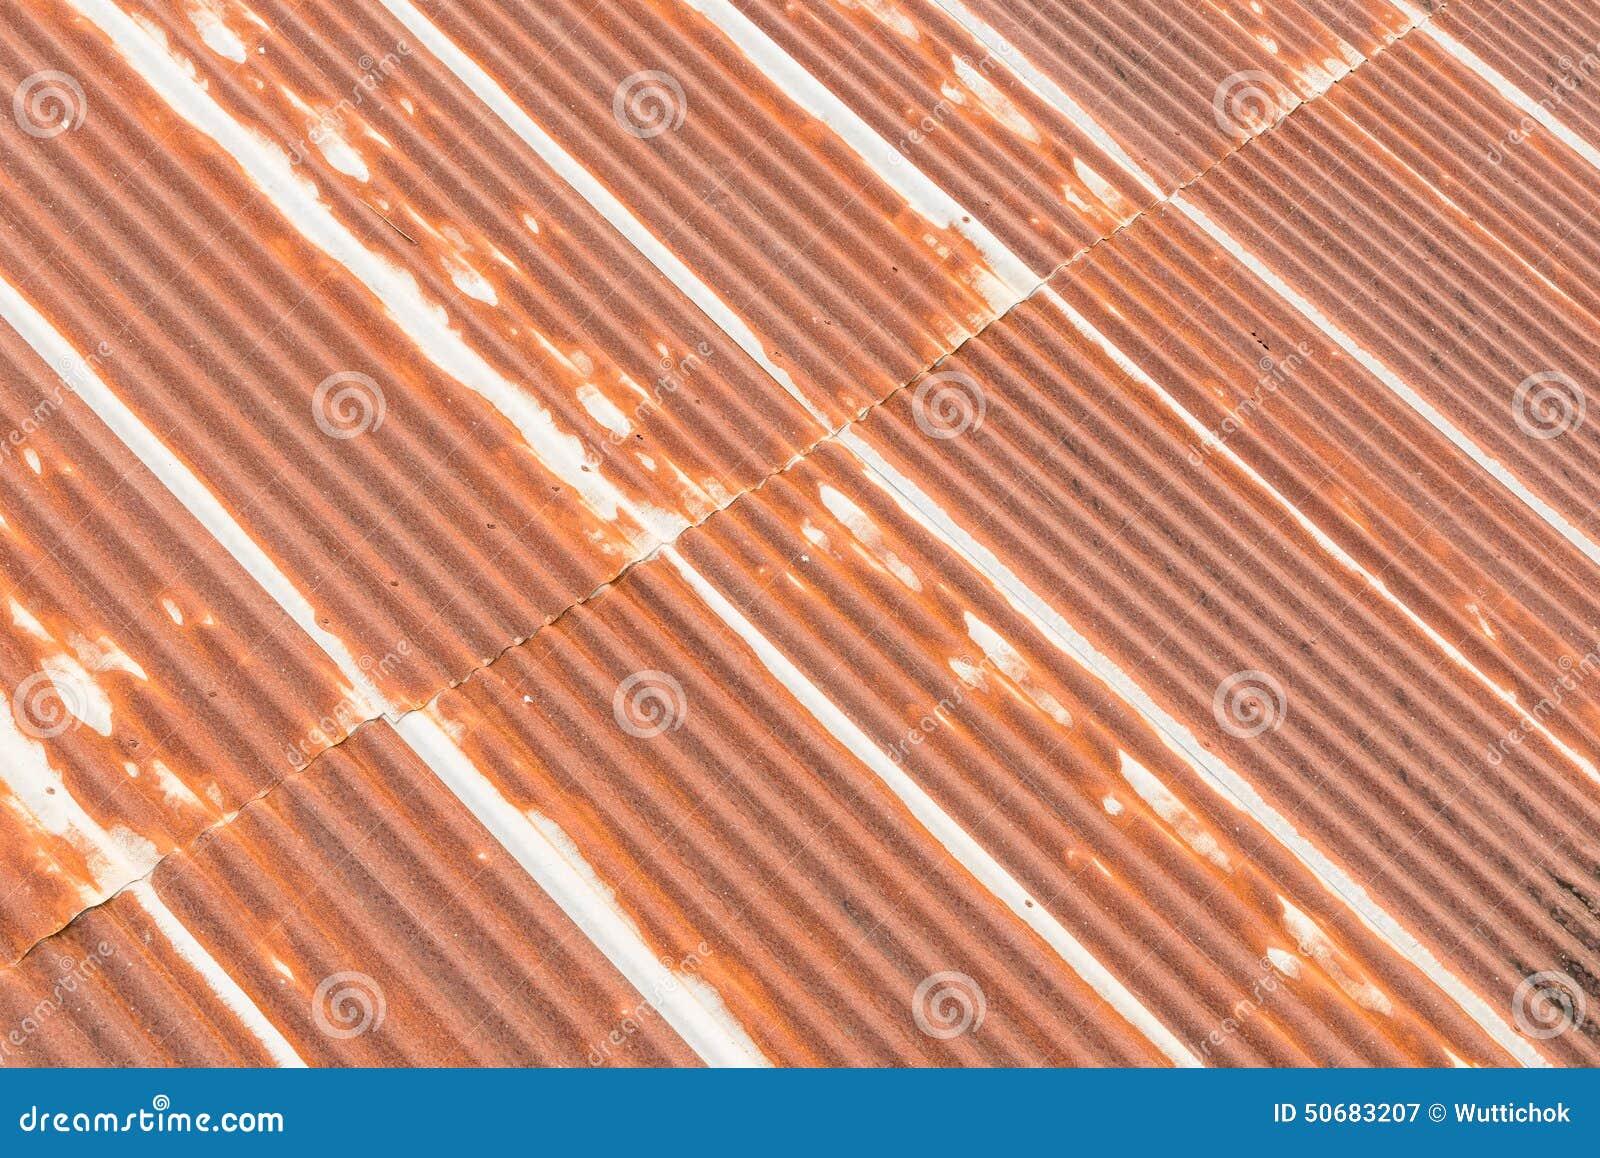 Download 老屋顶老生锈的被镀锌的钢 库存图片. 图片 包括有 拱道, 范围, 外部, 橙色, 油漆, 建筑, 模式 - 50683207